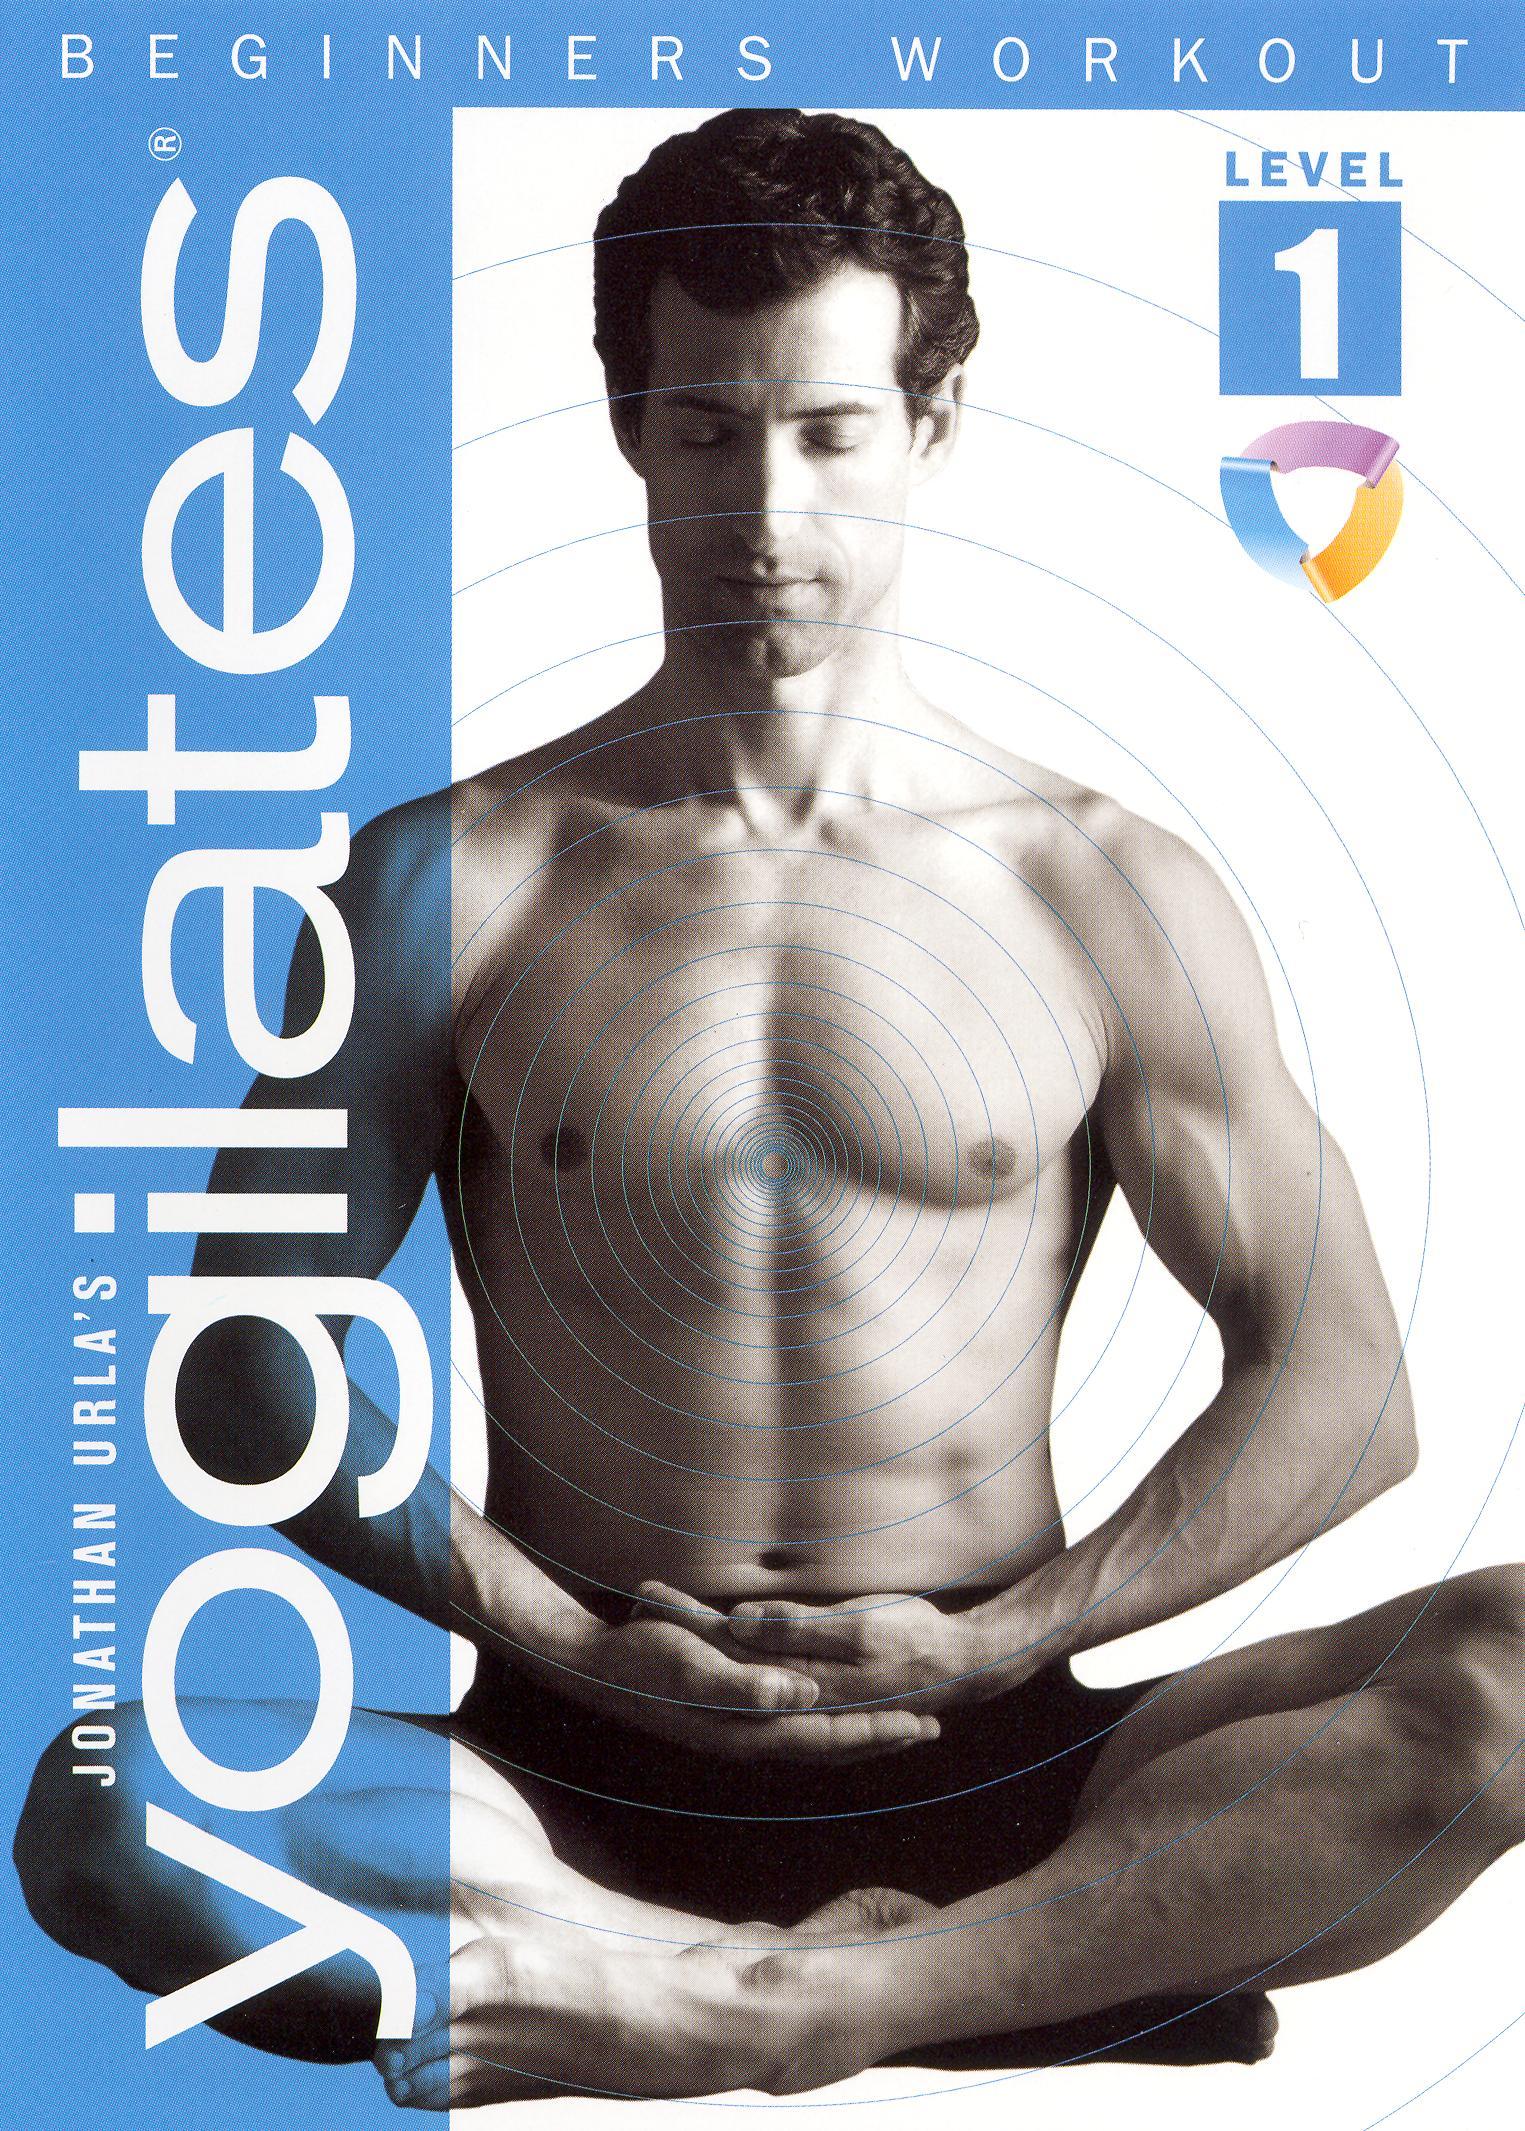 Yogilates: Beginner Workout